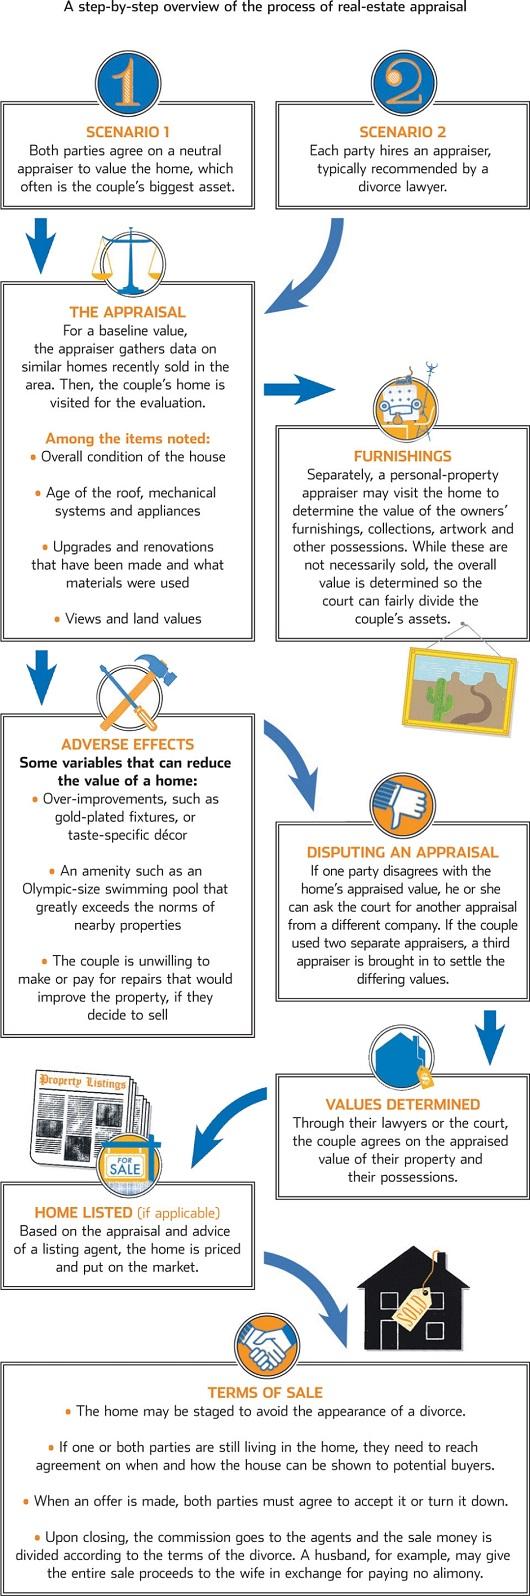 sacramento-home-appraiser-divorce-appraisal-process-via-wsj